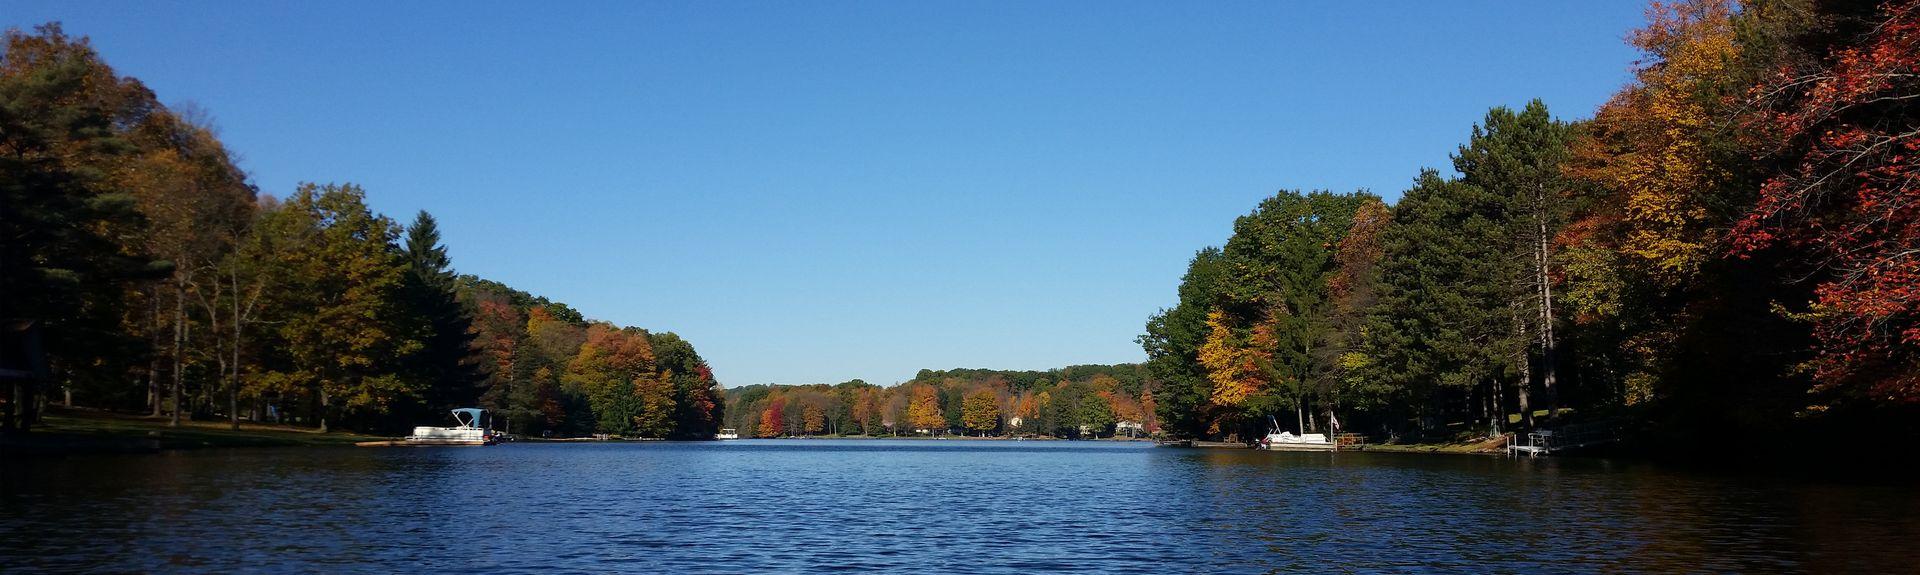 Treasure Lake, DuBois, Pennsylvania, United States of America